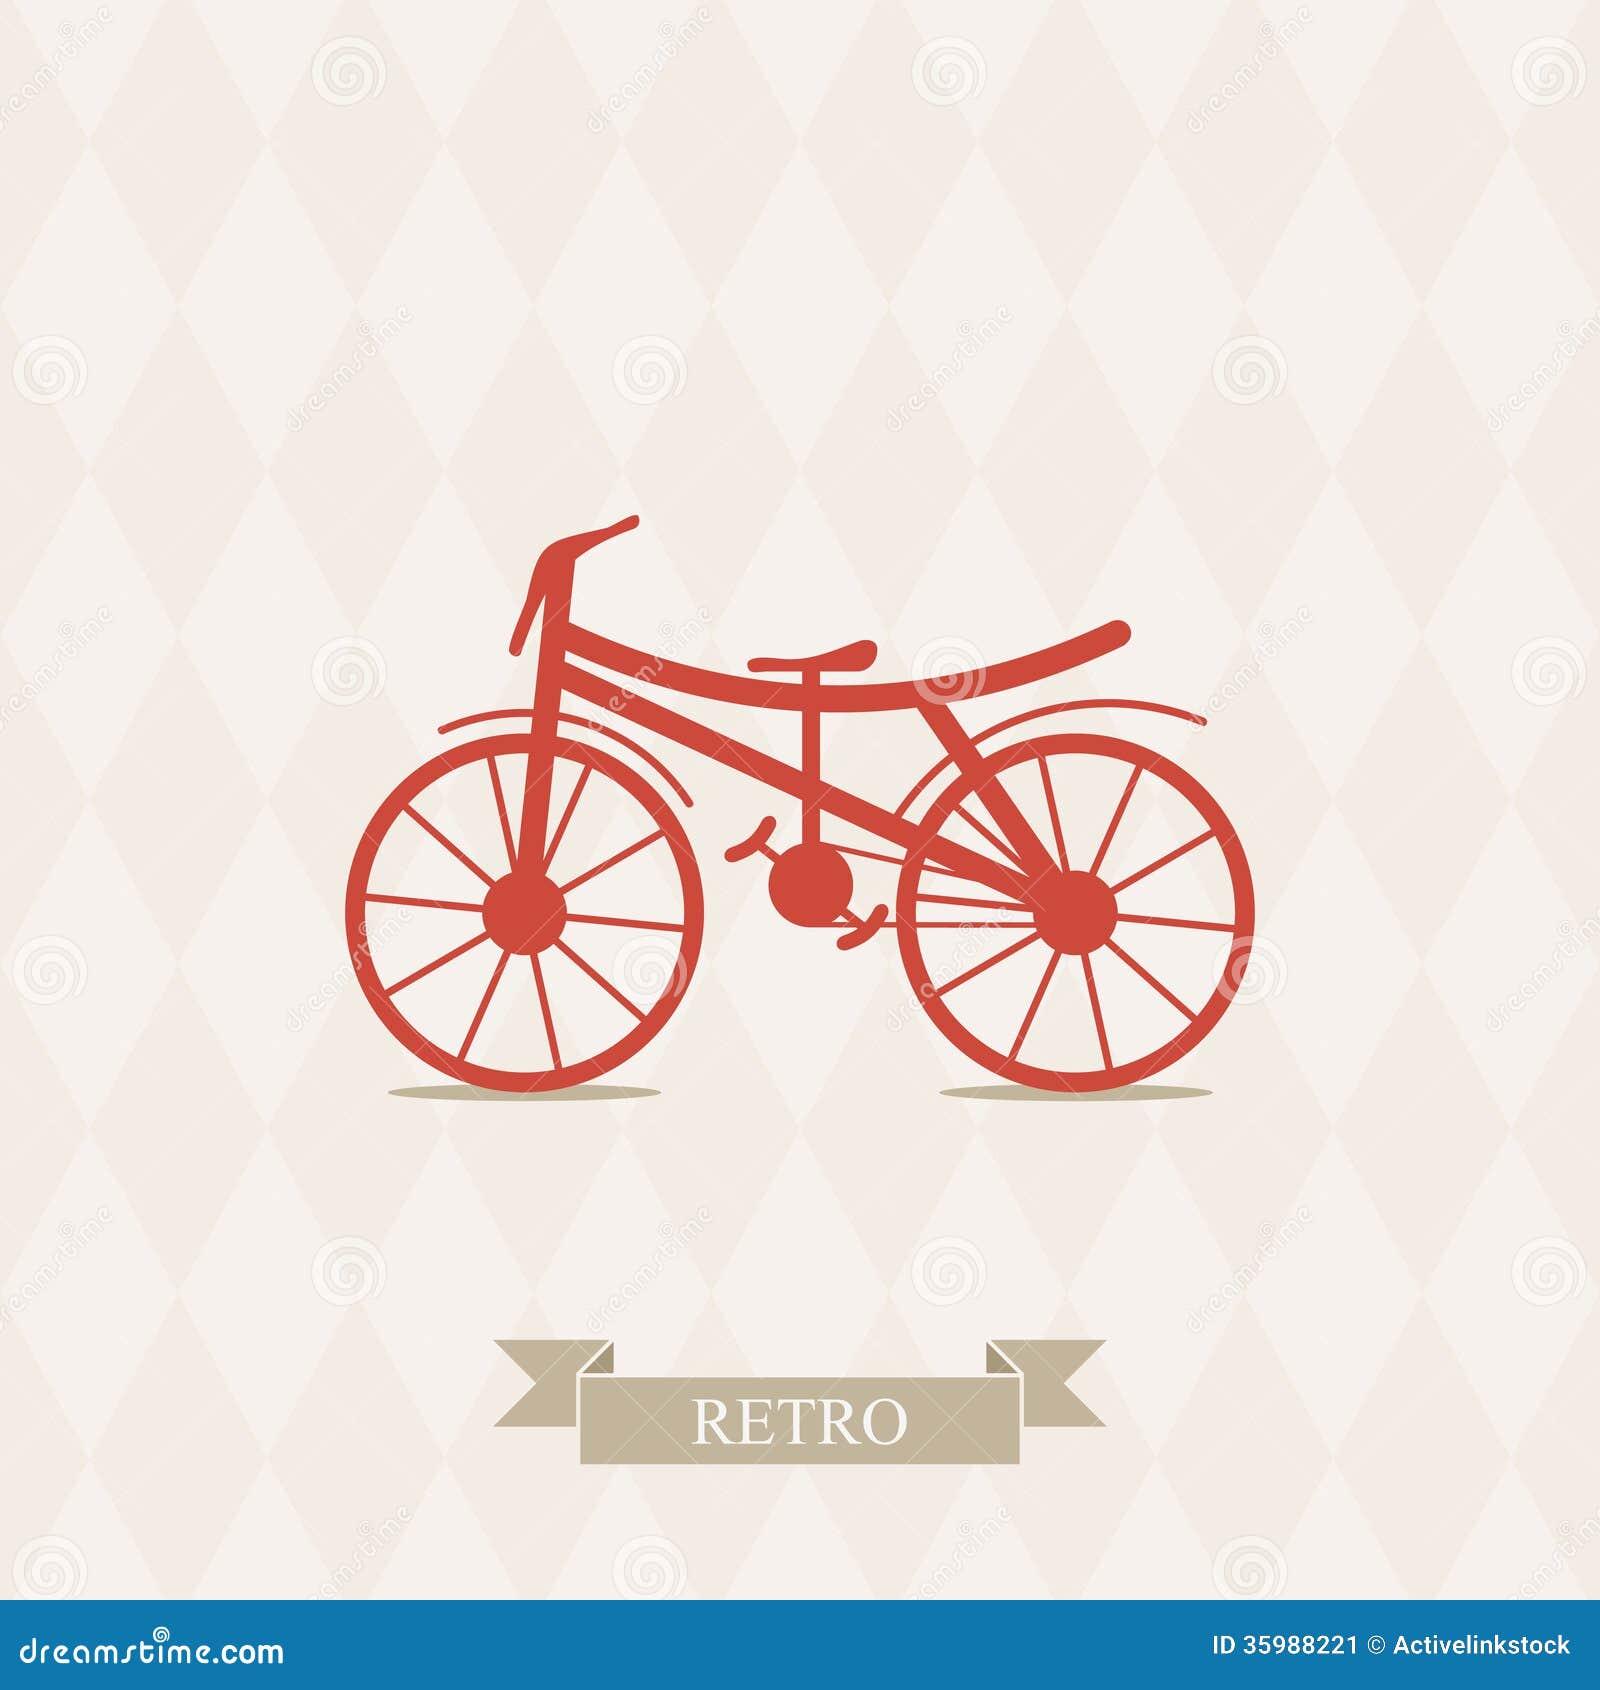 Bicycle illustration retro - photo#9